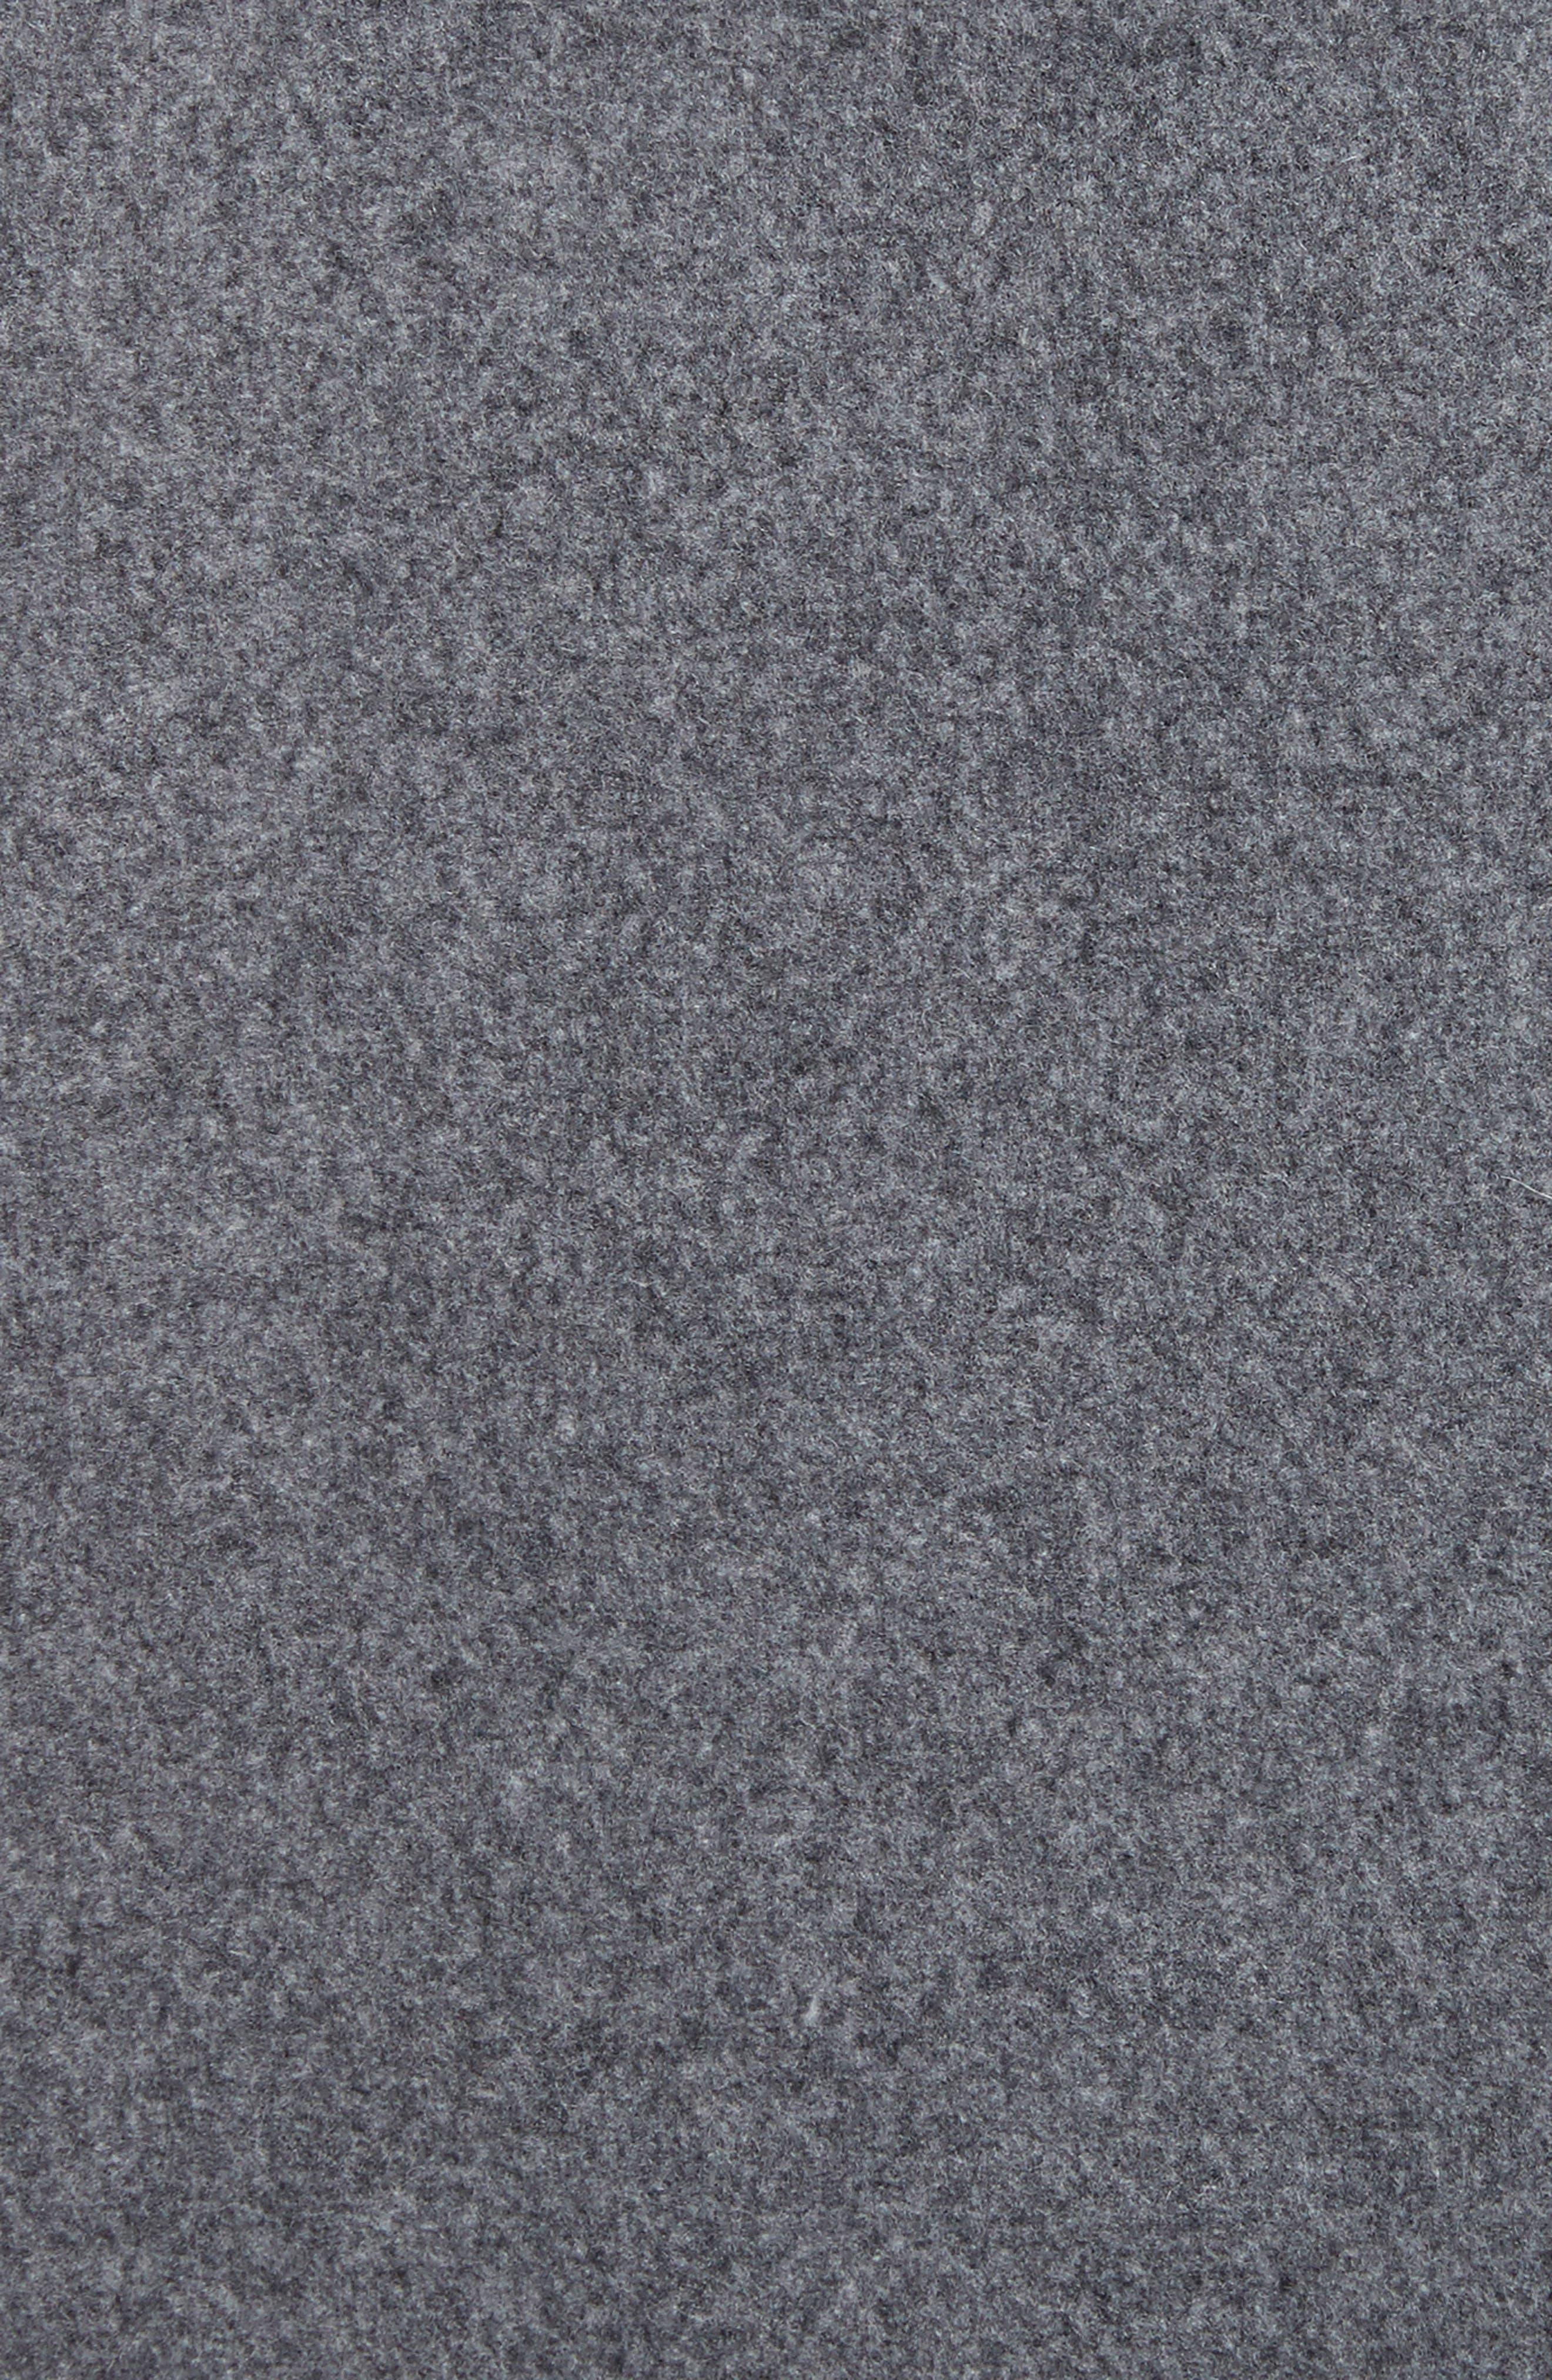 Laporta Genuine Shearling Trim Wool Blend Hooded Coat,                             Alternate thumbnail 6, color,                             Dark Grey